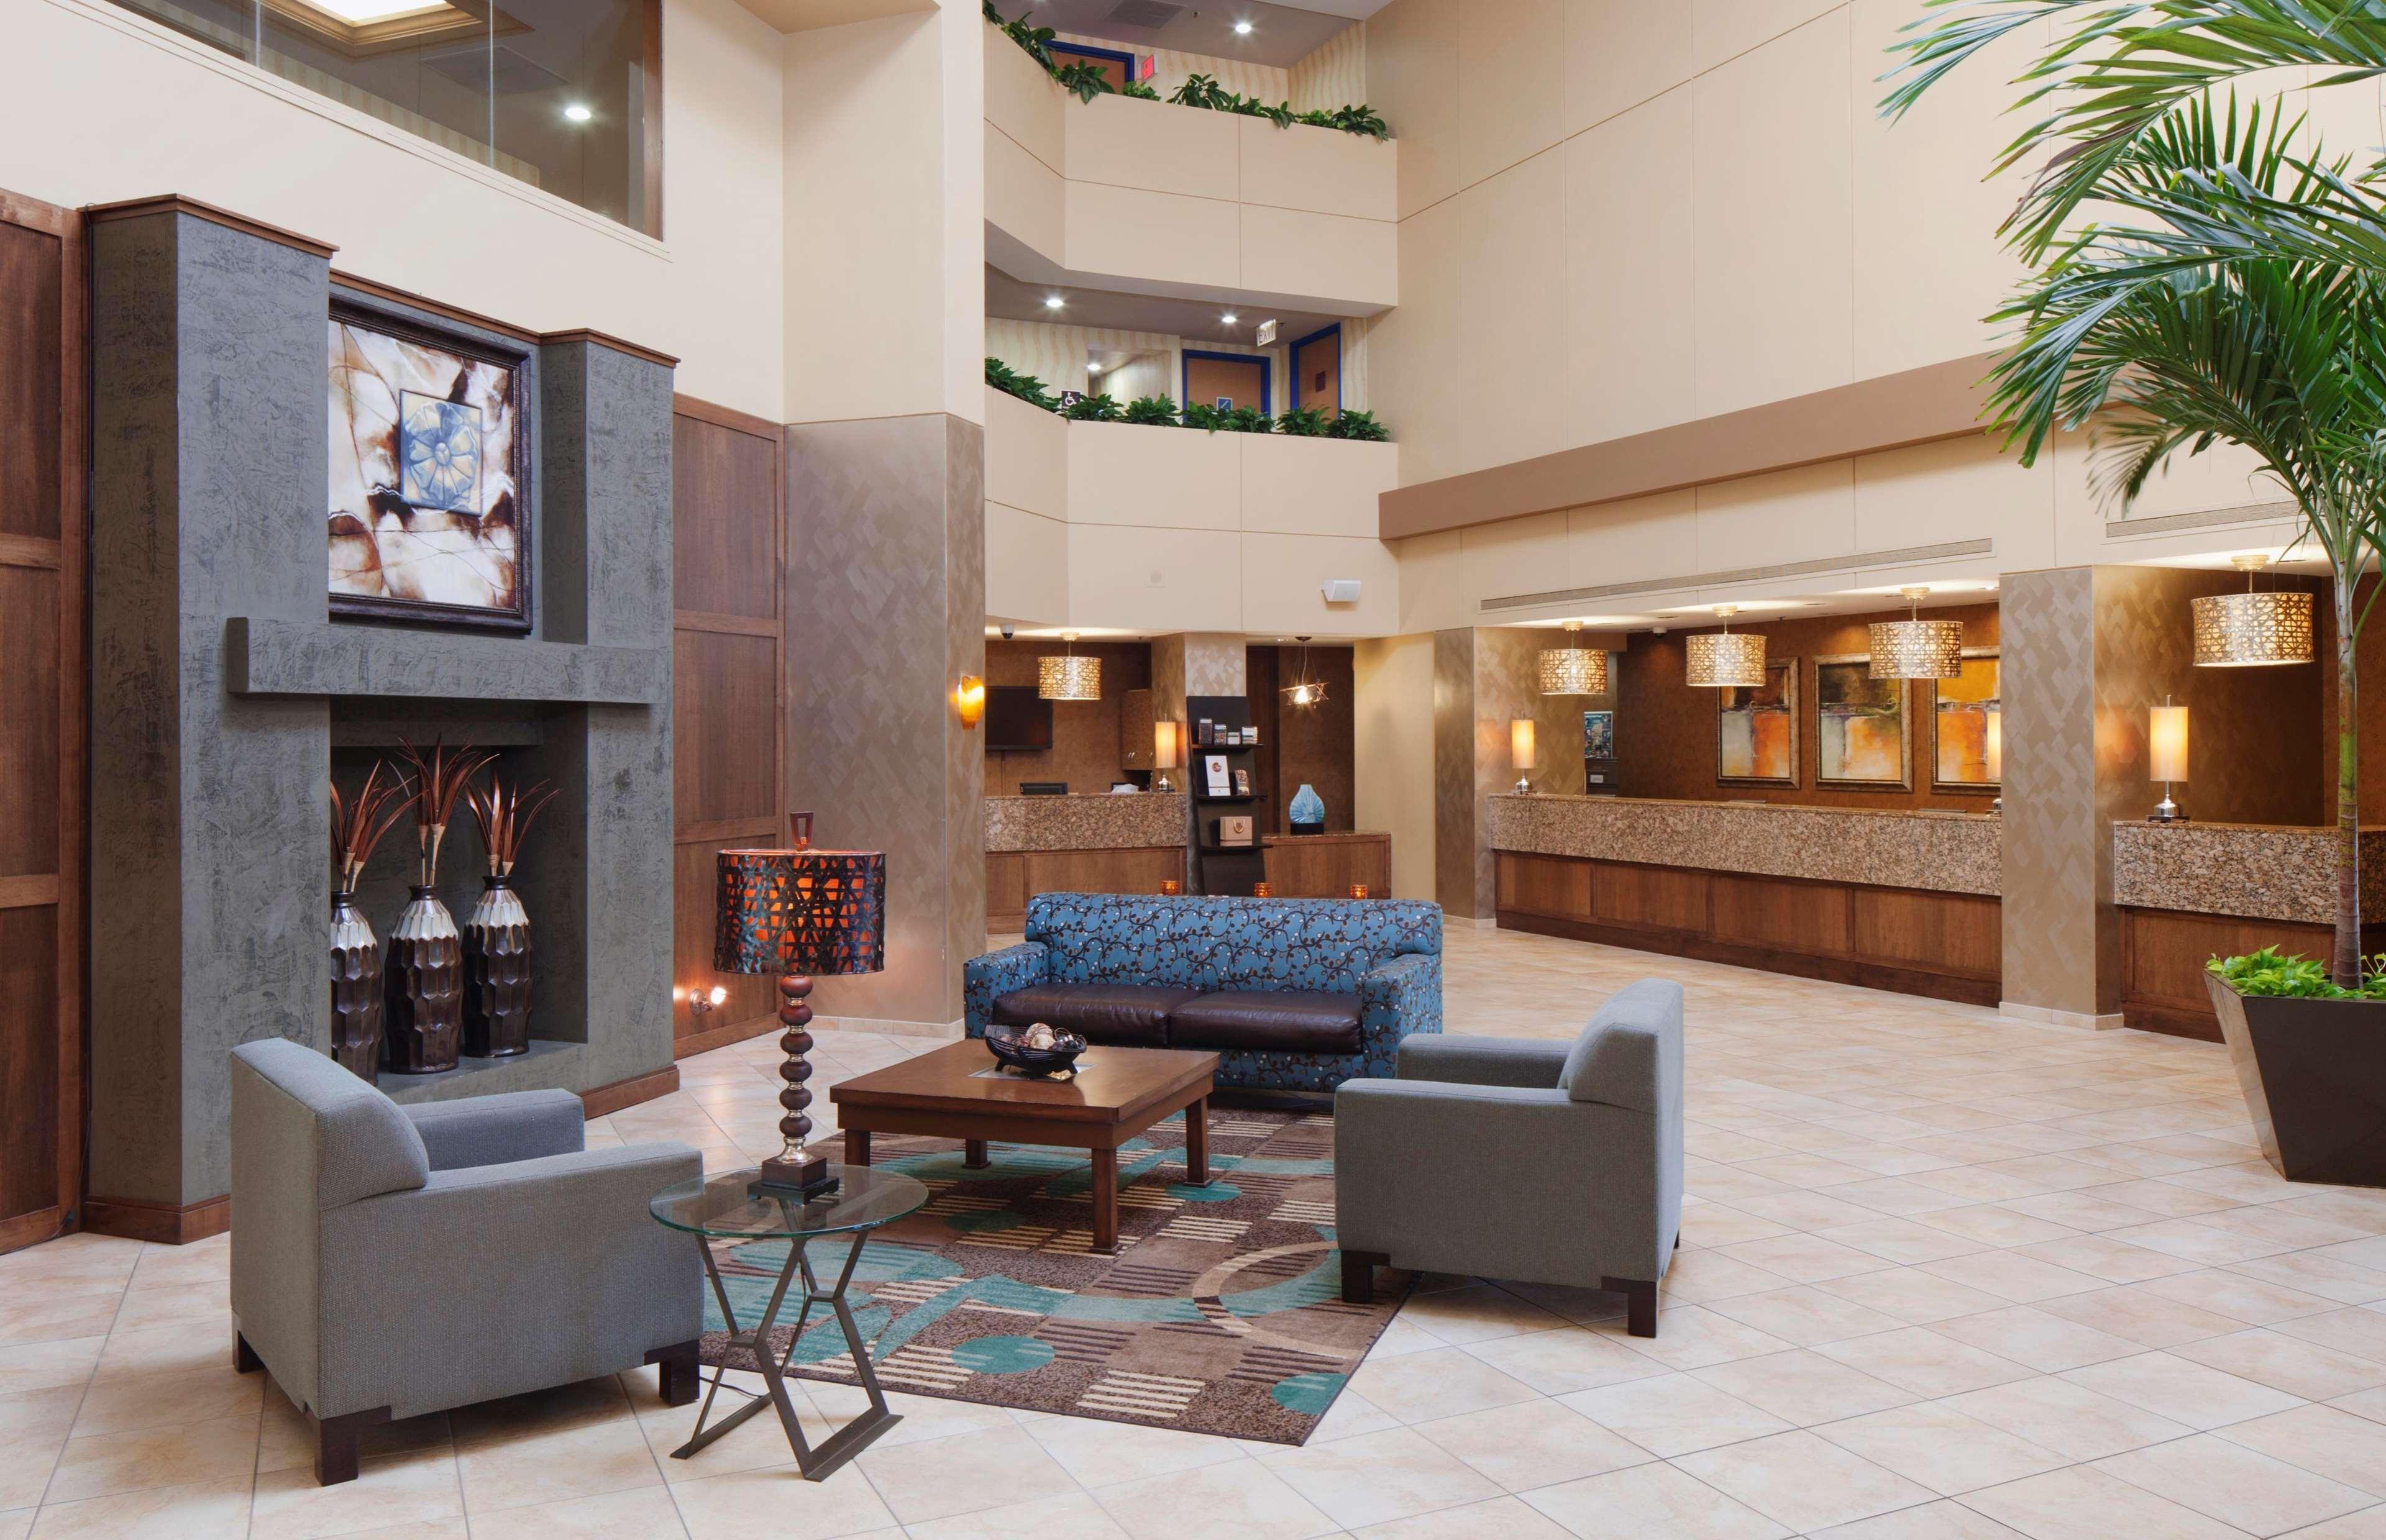 DoubleTree Suites by Hilton Orlando - Disney Springs Area image 1